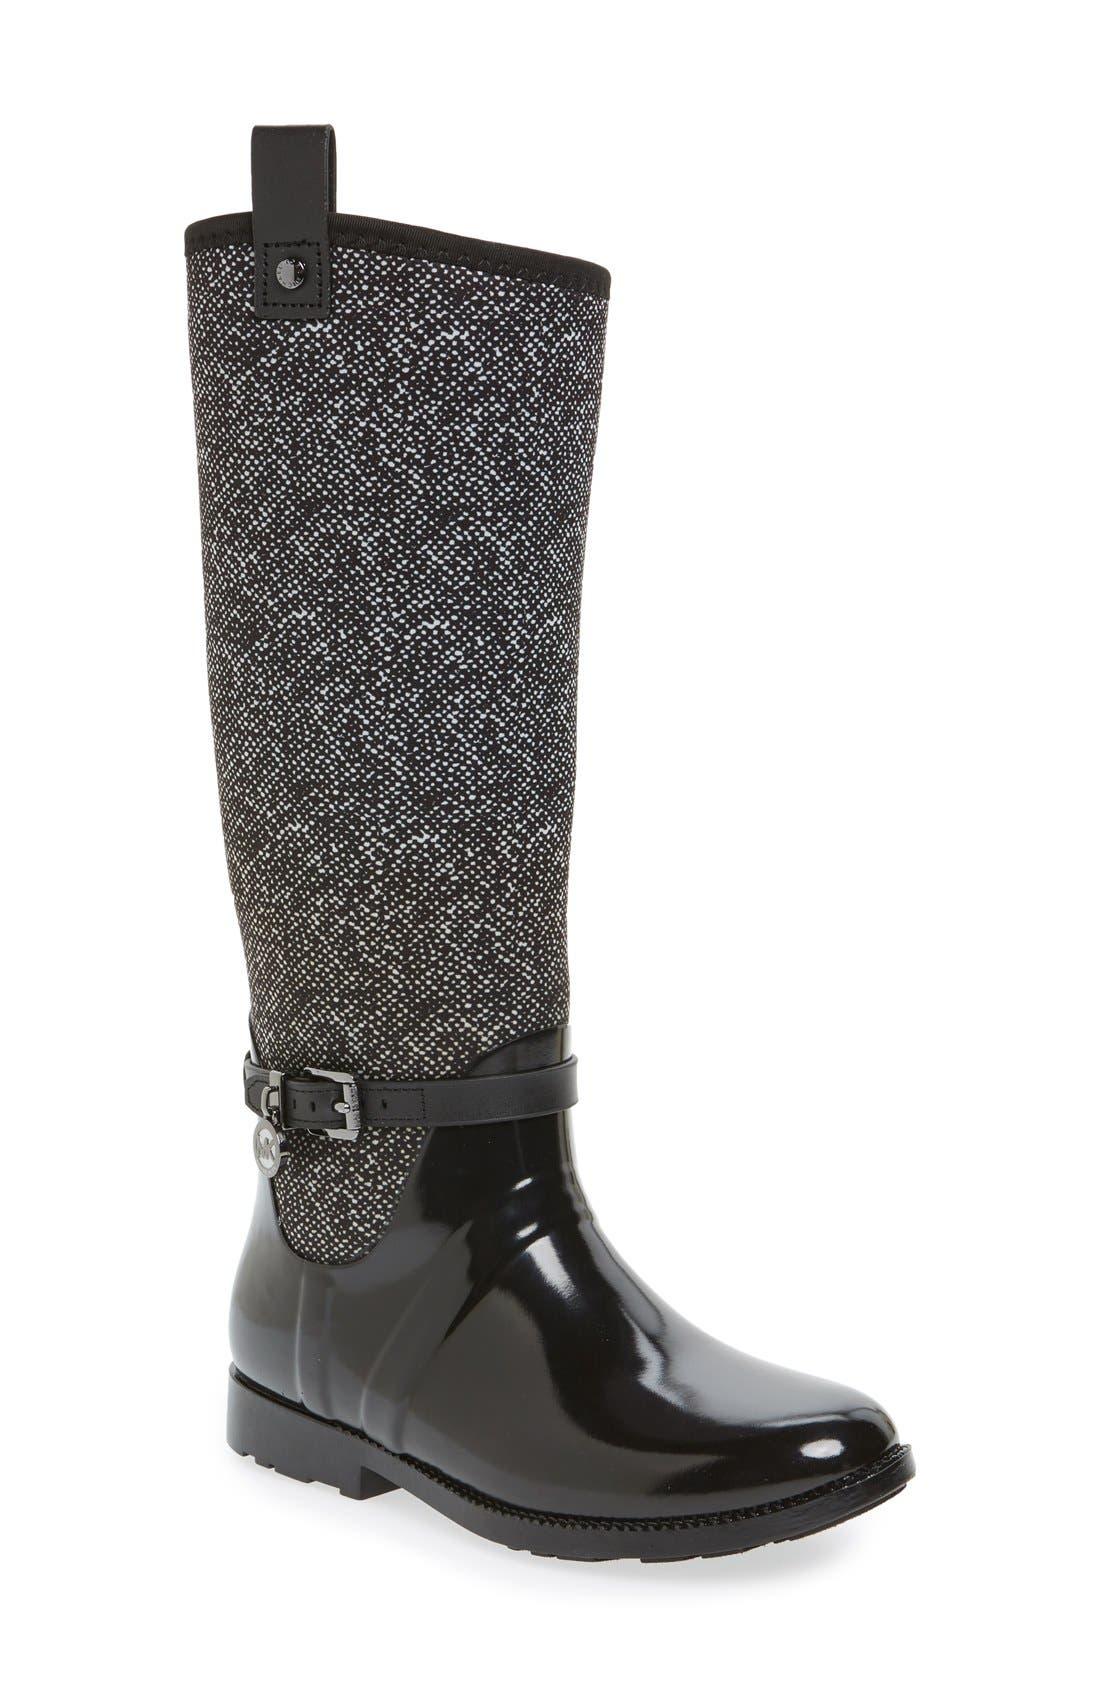 Alternate Image 1 Selected - MICHAEL Michael Kors Charm Stretch Rain Boot (Women) (Nordstrom Exclusive)